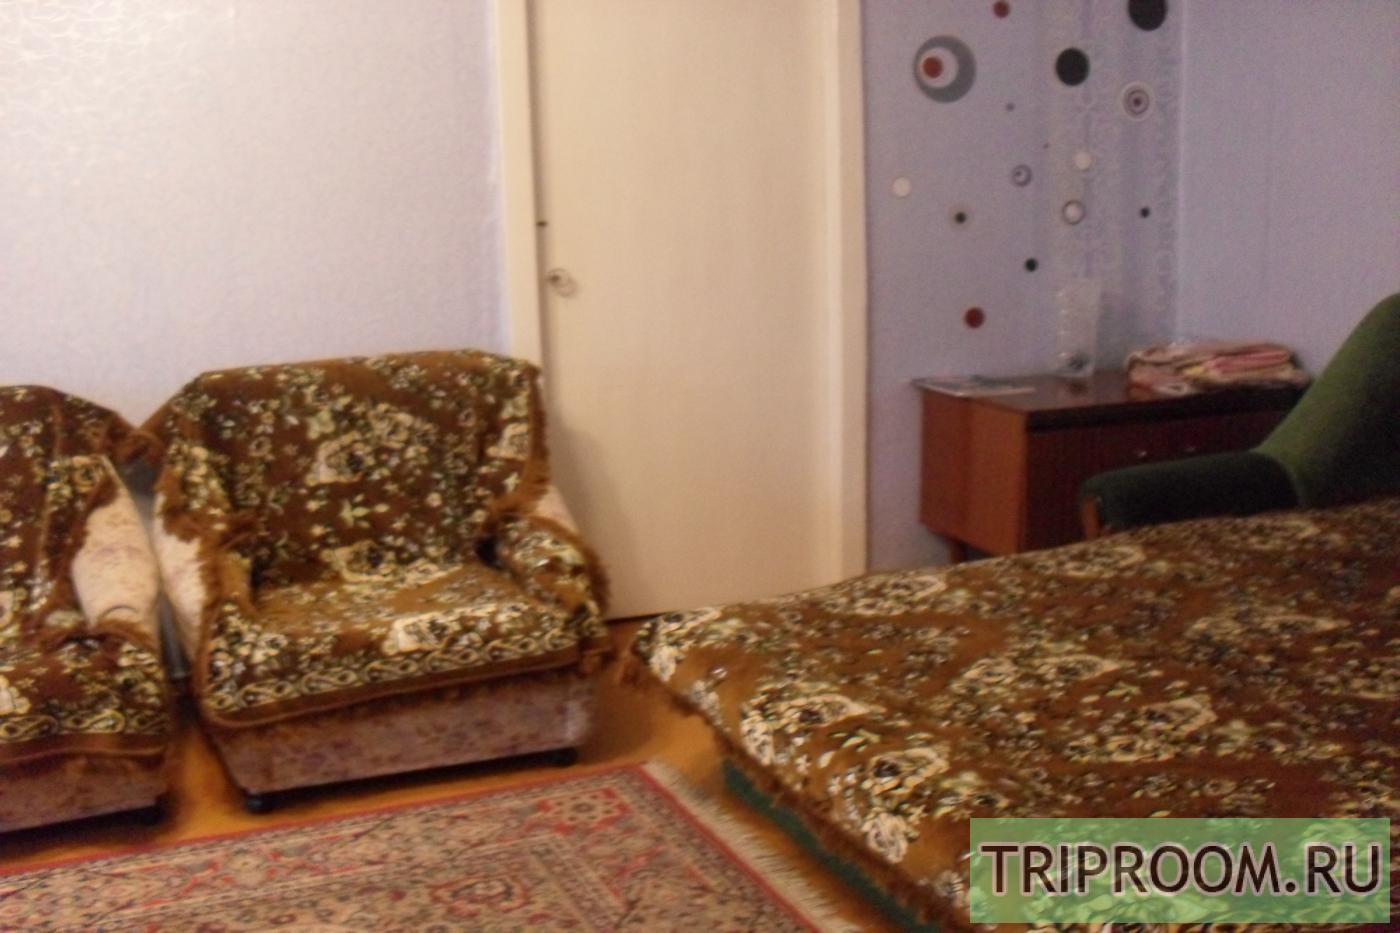 2-комнатная квартира посуточно (вариант № 4940), ул. Еременко улица, фото № 3